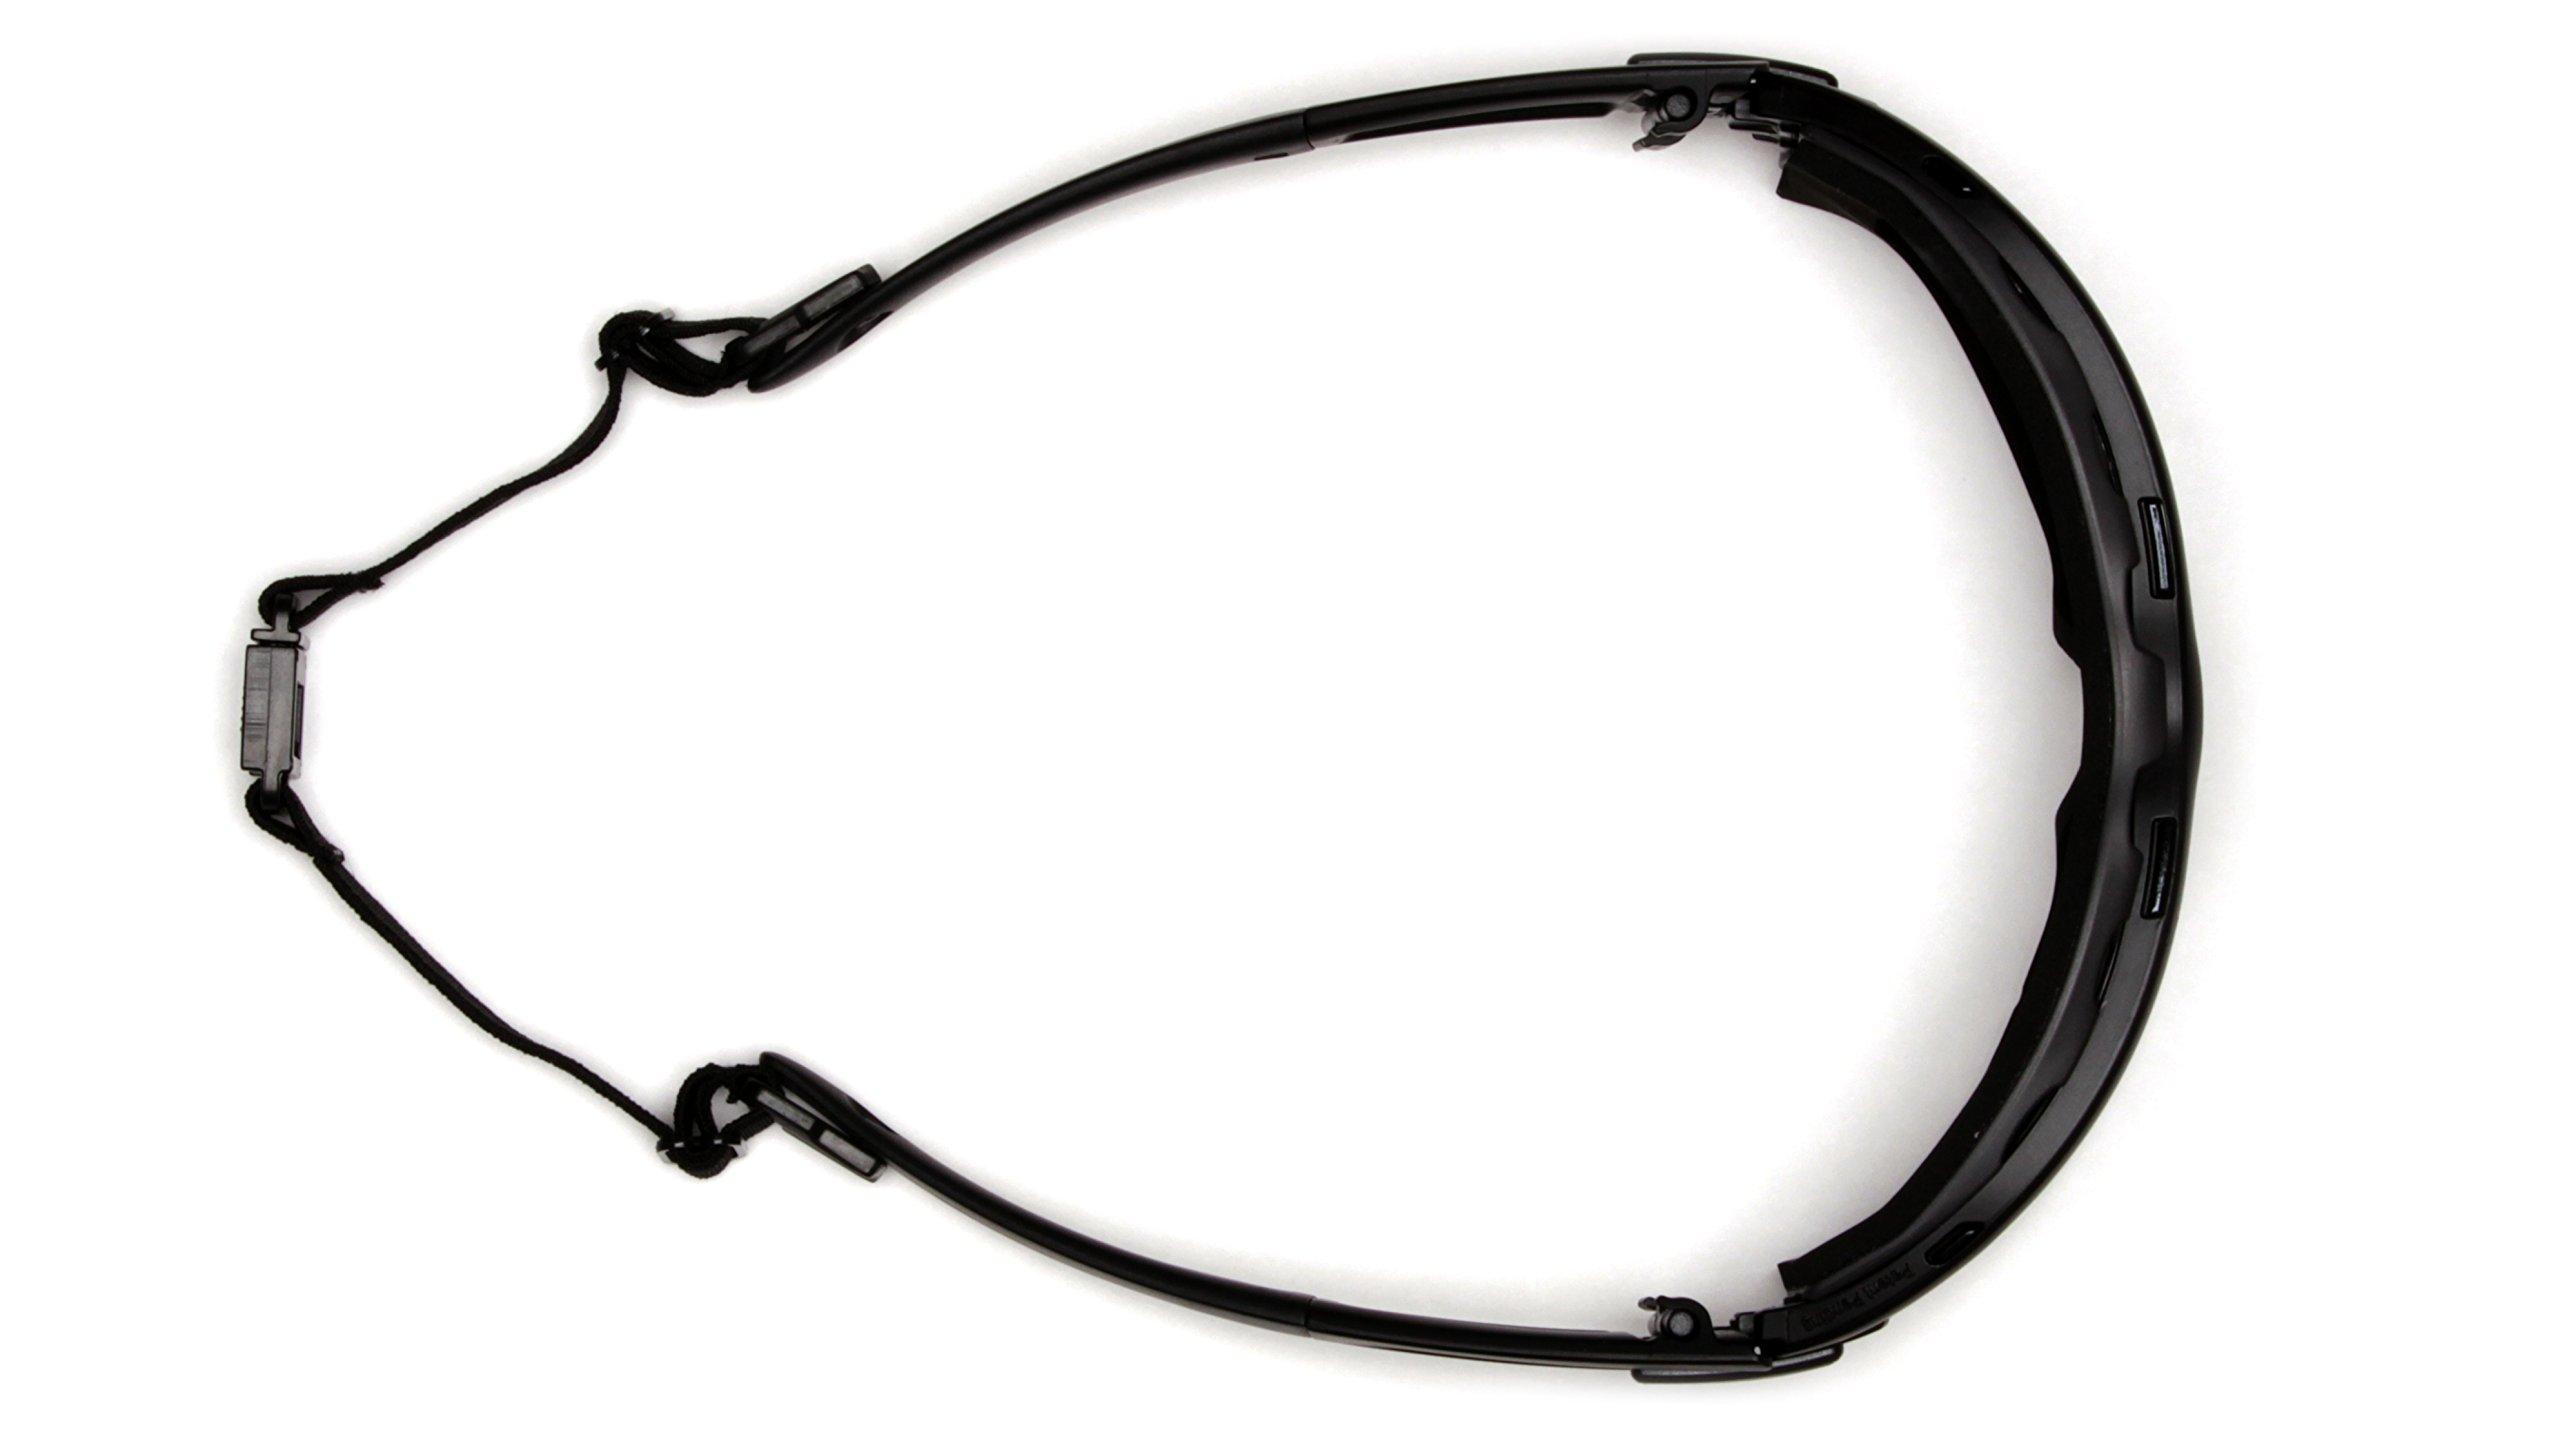 Pyramex I-Force Slim Safety Goggle, Black Frame/Amber Anti-Fog Lens by Pyramex (Image #4)